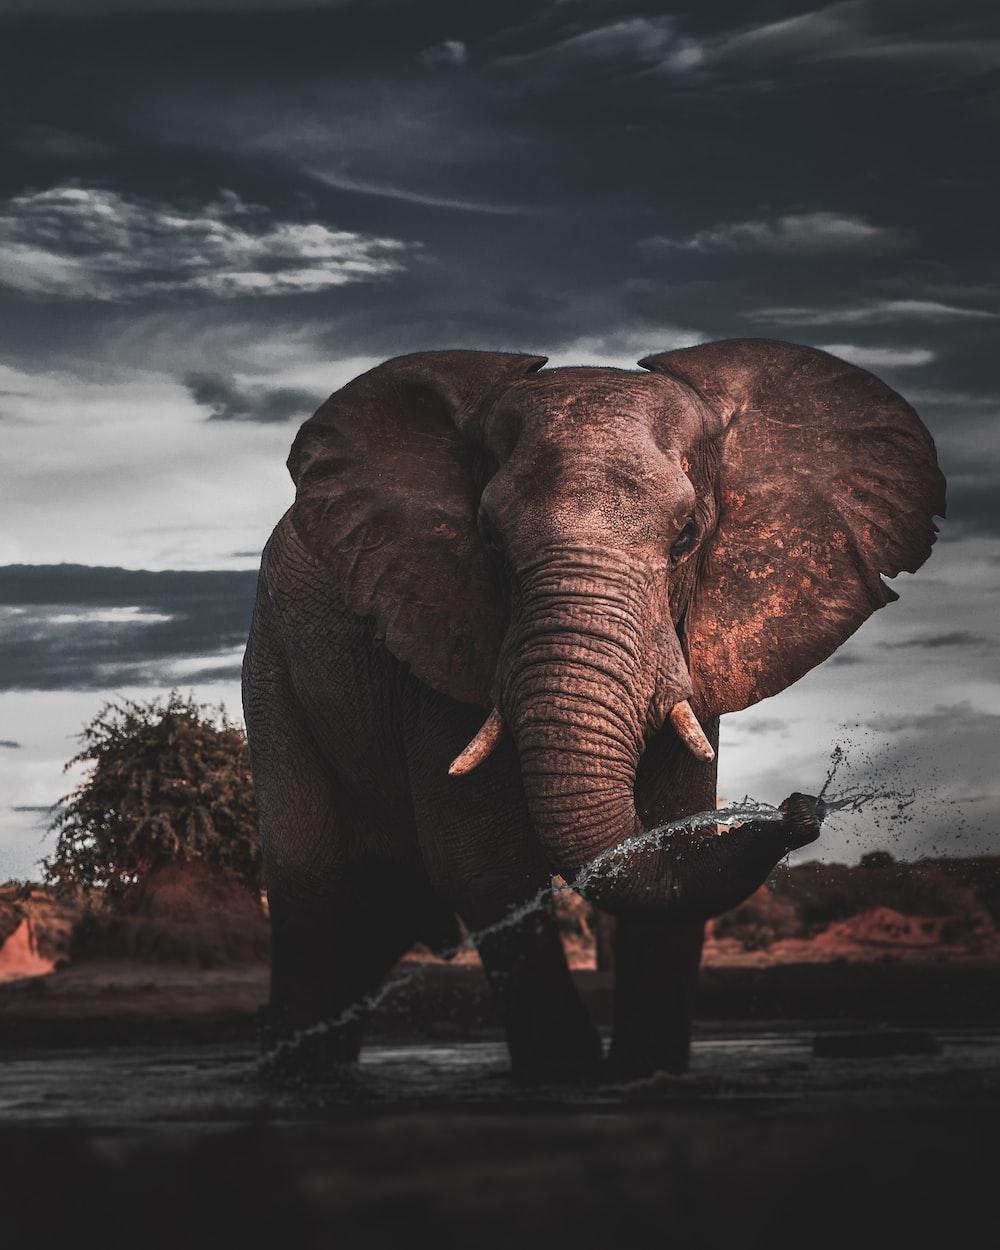 Elephant Wallpapers Free HD Download [21+ HQ]   Unsplash